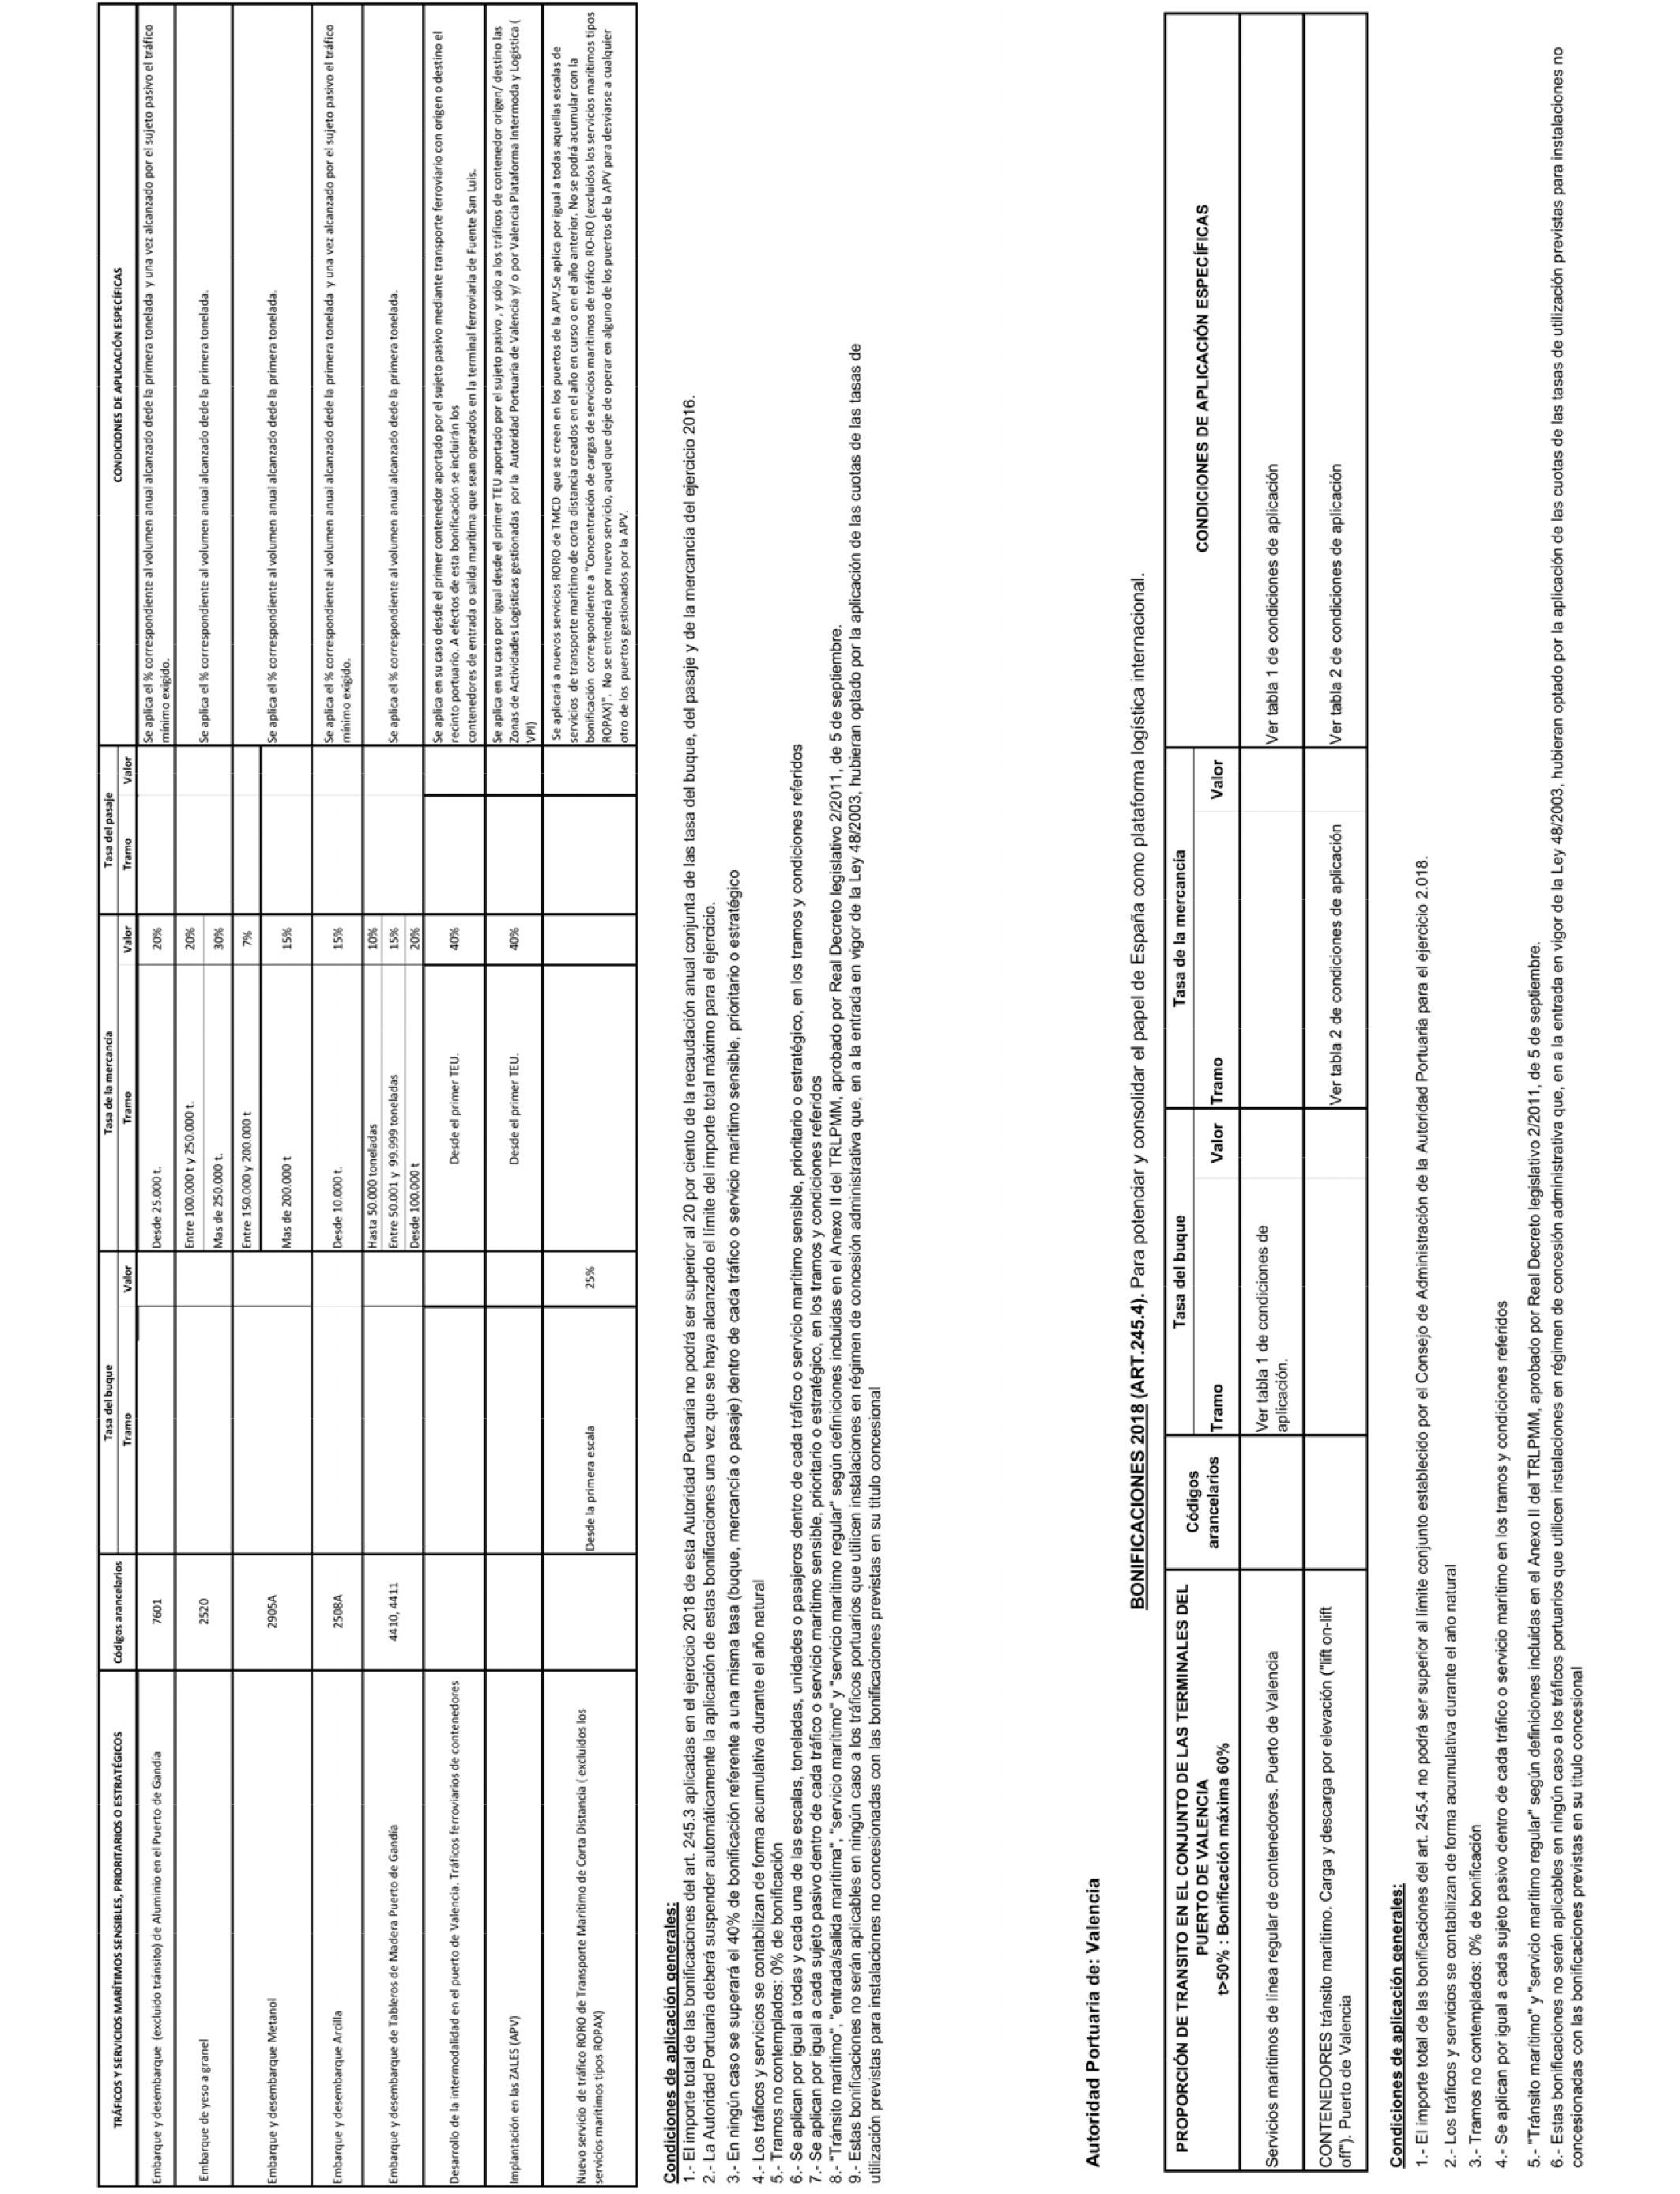 Calendario Oficial 2019 Alava Más Recientemente Liberado Boe Documento Consolidado Boe A 2018 9268 Of Calendario Oficial 2019 Alava Más Reciente Boe Documento Boe A 2018 9268